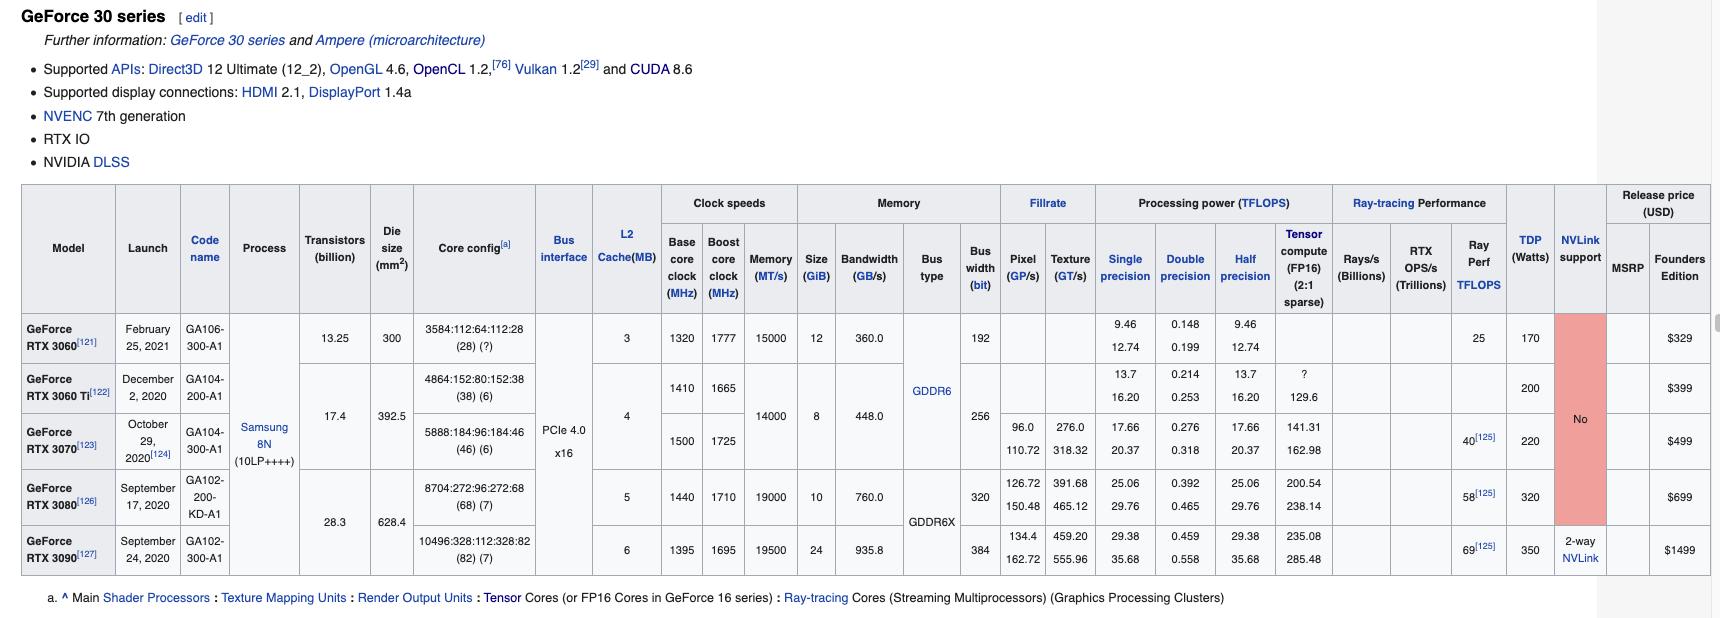 wikipedia_nvidia_gpu_table_screenshot.png